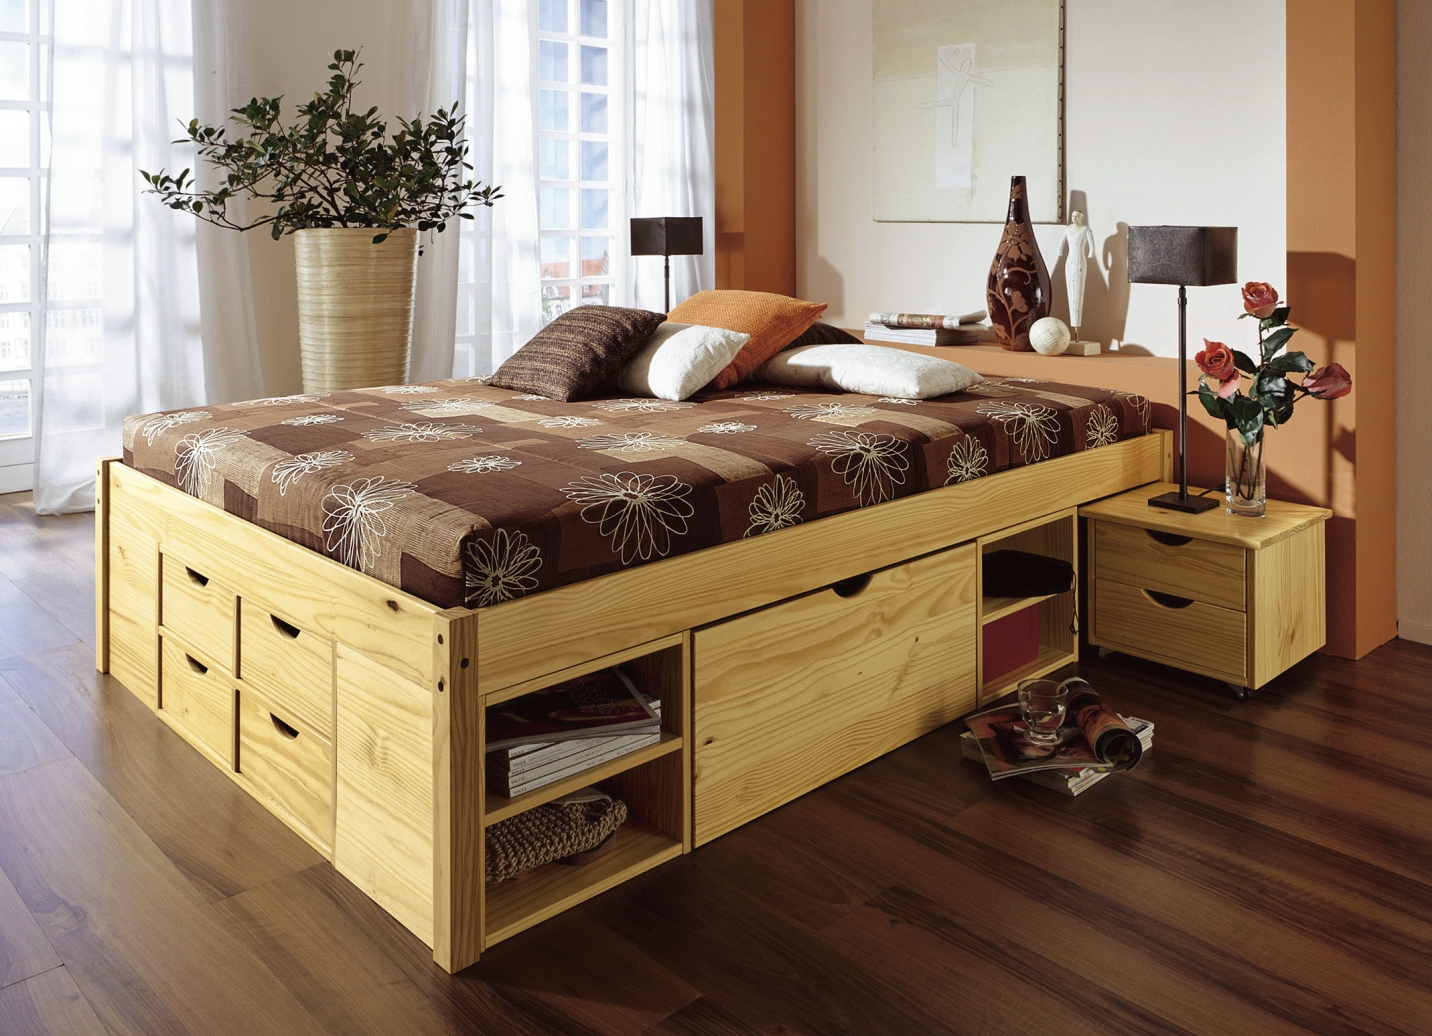 funktionsbett verschiedene ausf hrungen. Black Bedroom Furniture Sets. Home Design Ideas